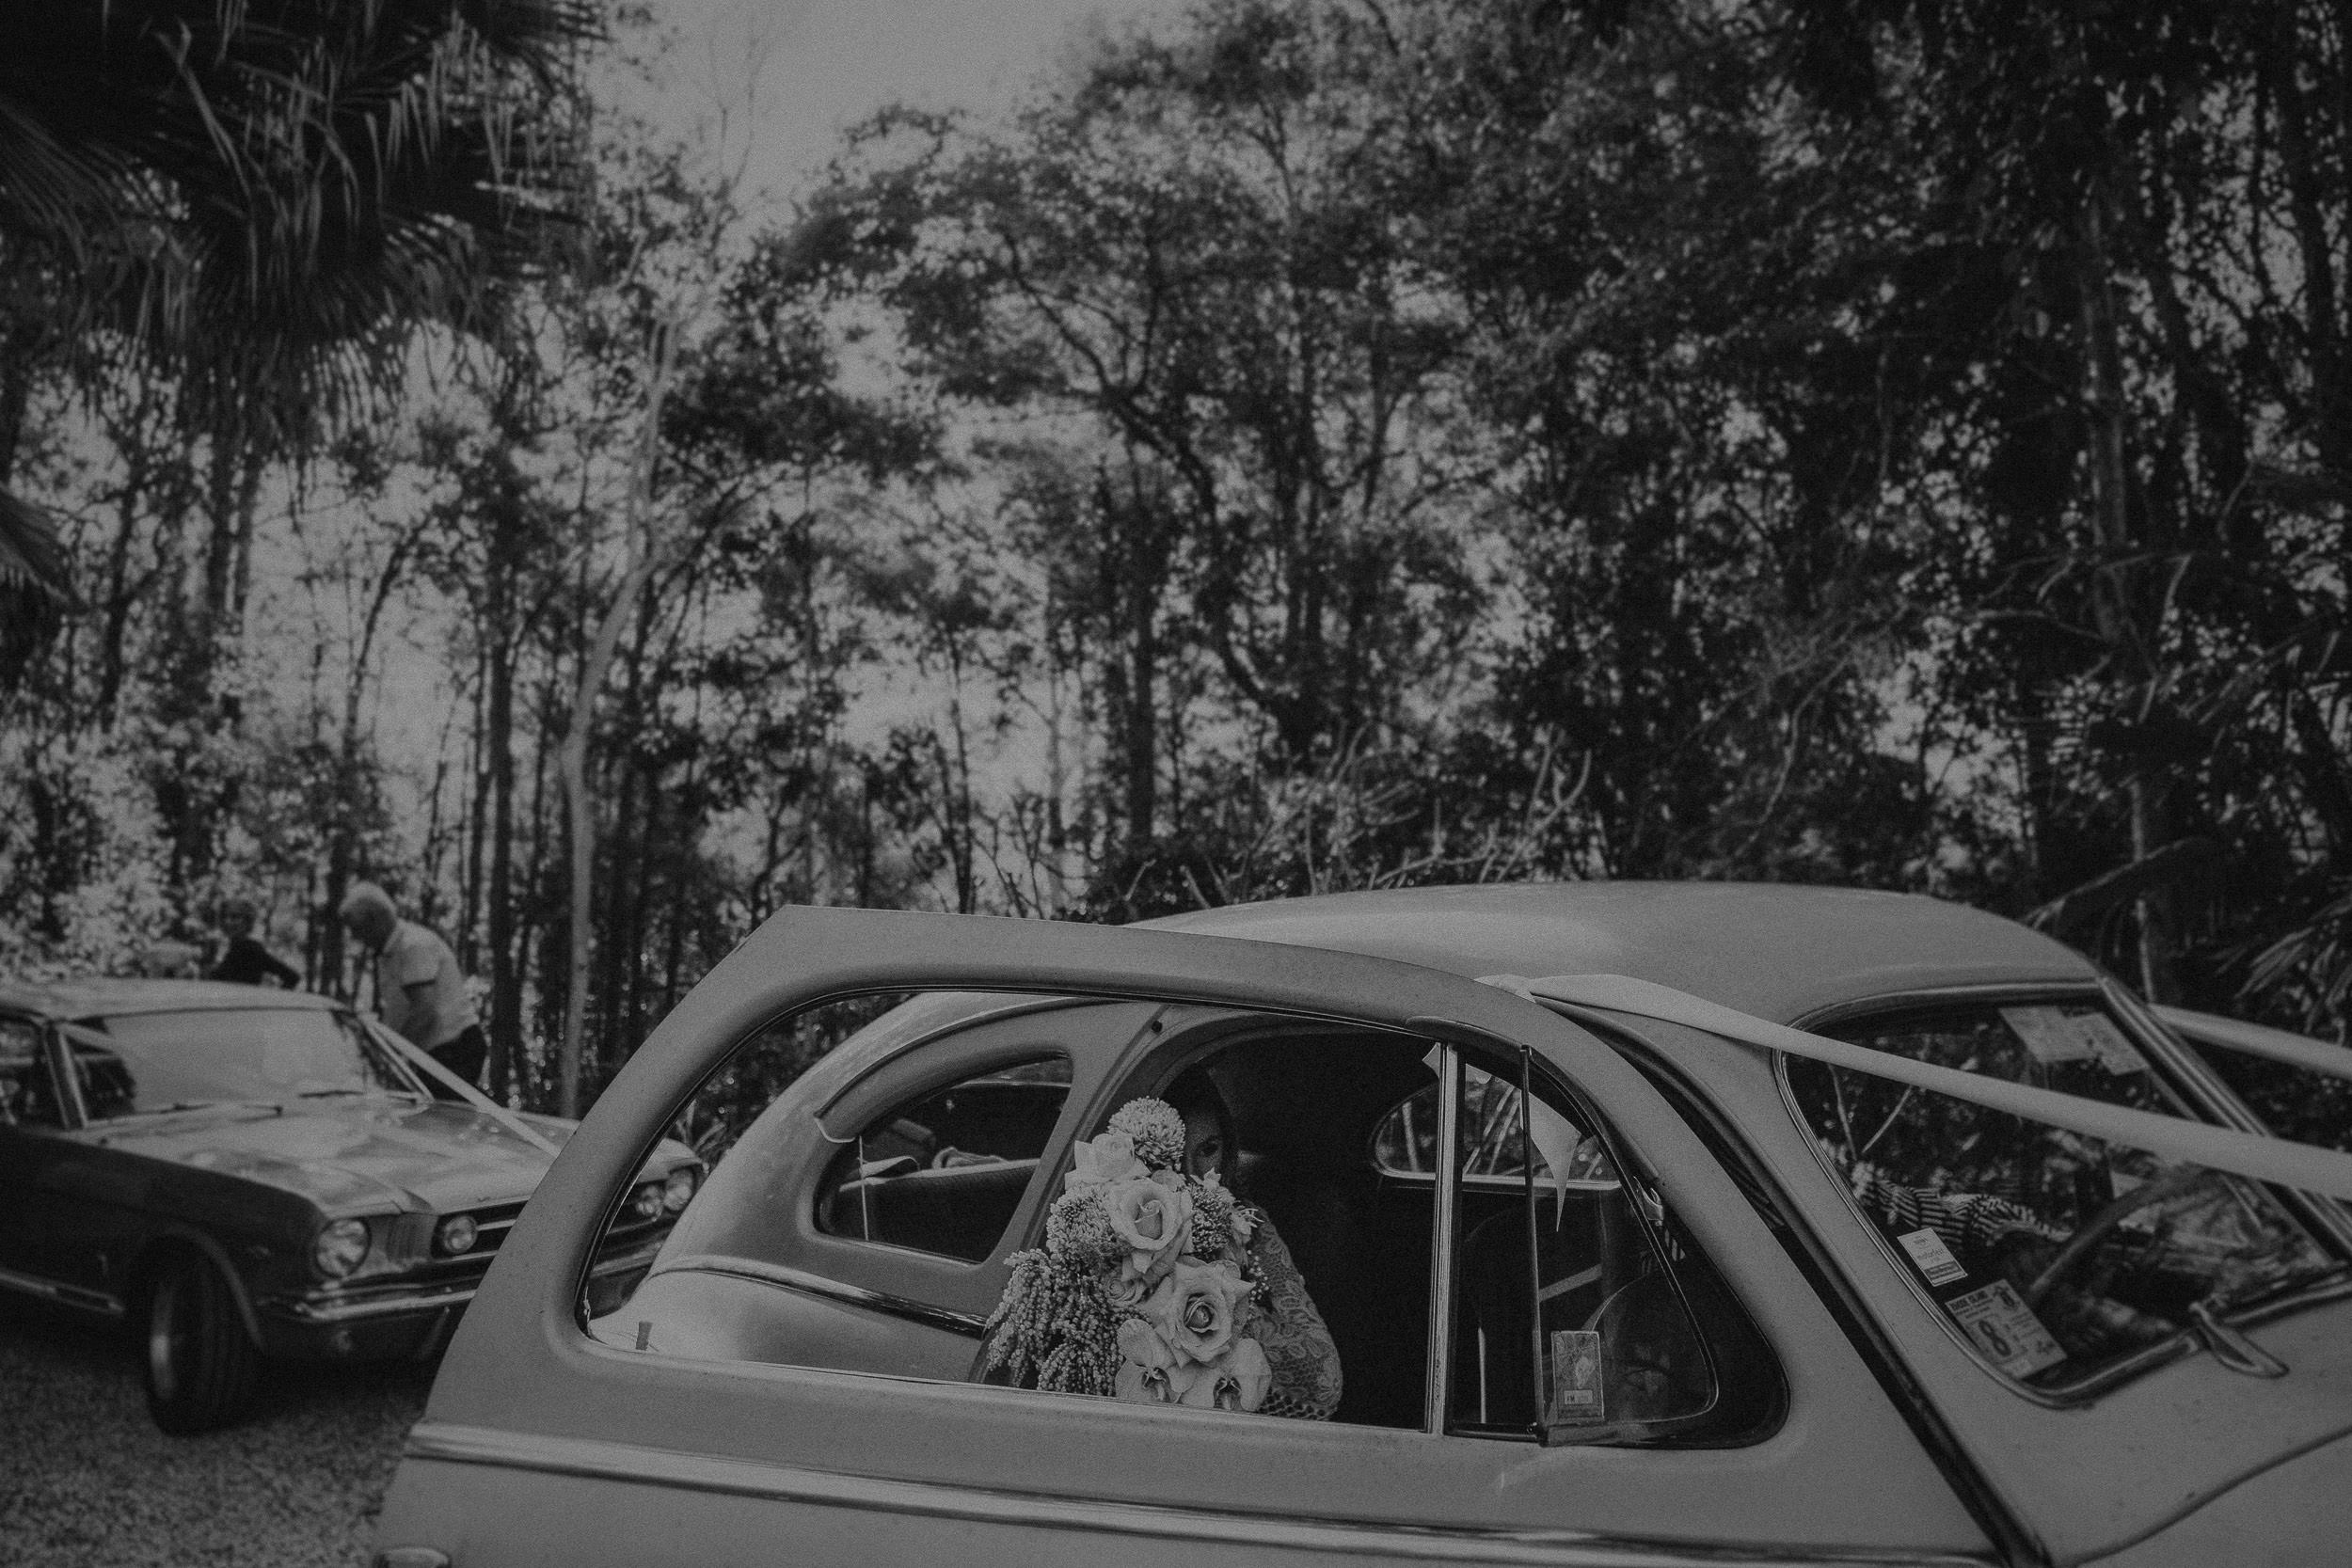 S&A Elopement - Kings & Thieves - Shred 'Til Dead - Central Coast Beach Forest Wedding - 145.jpg